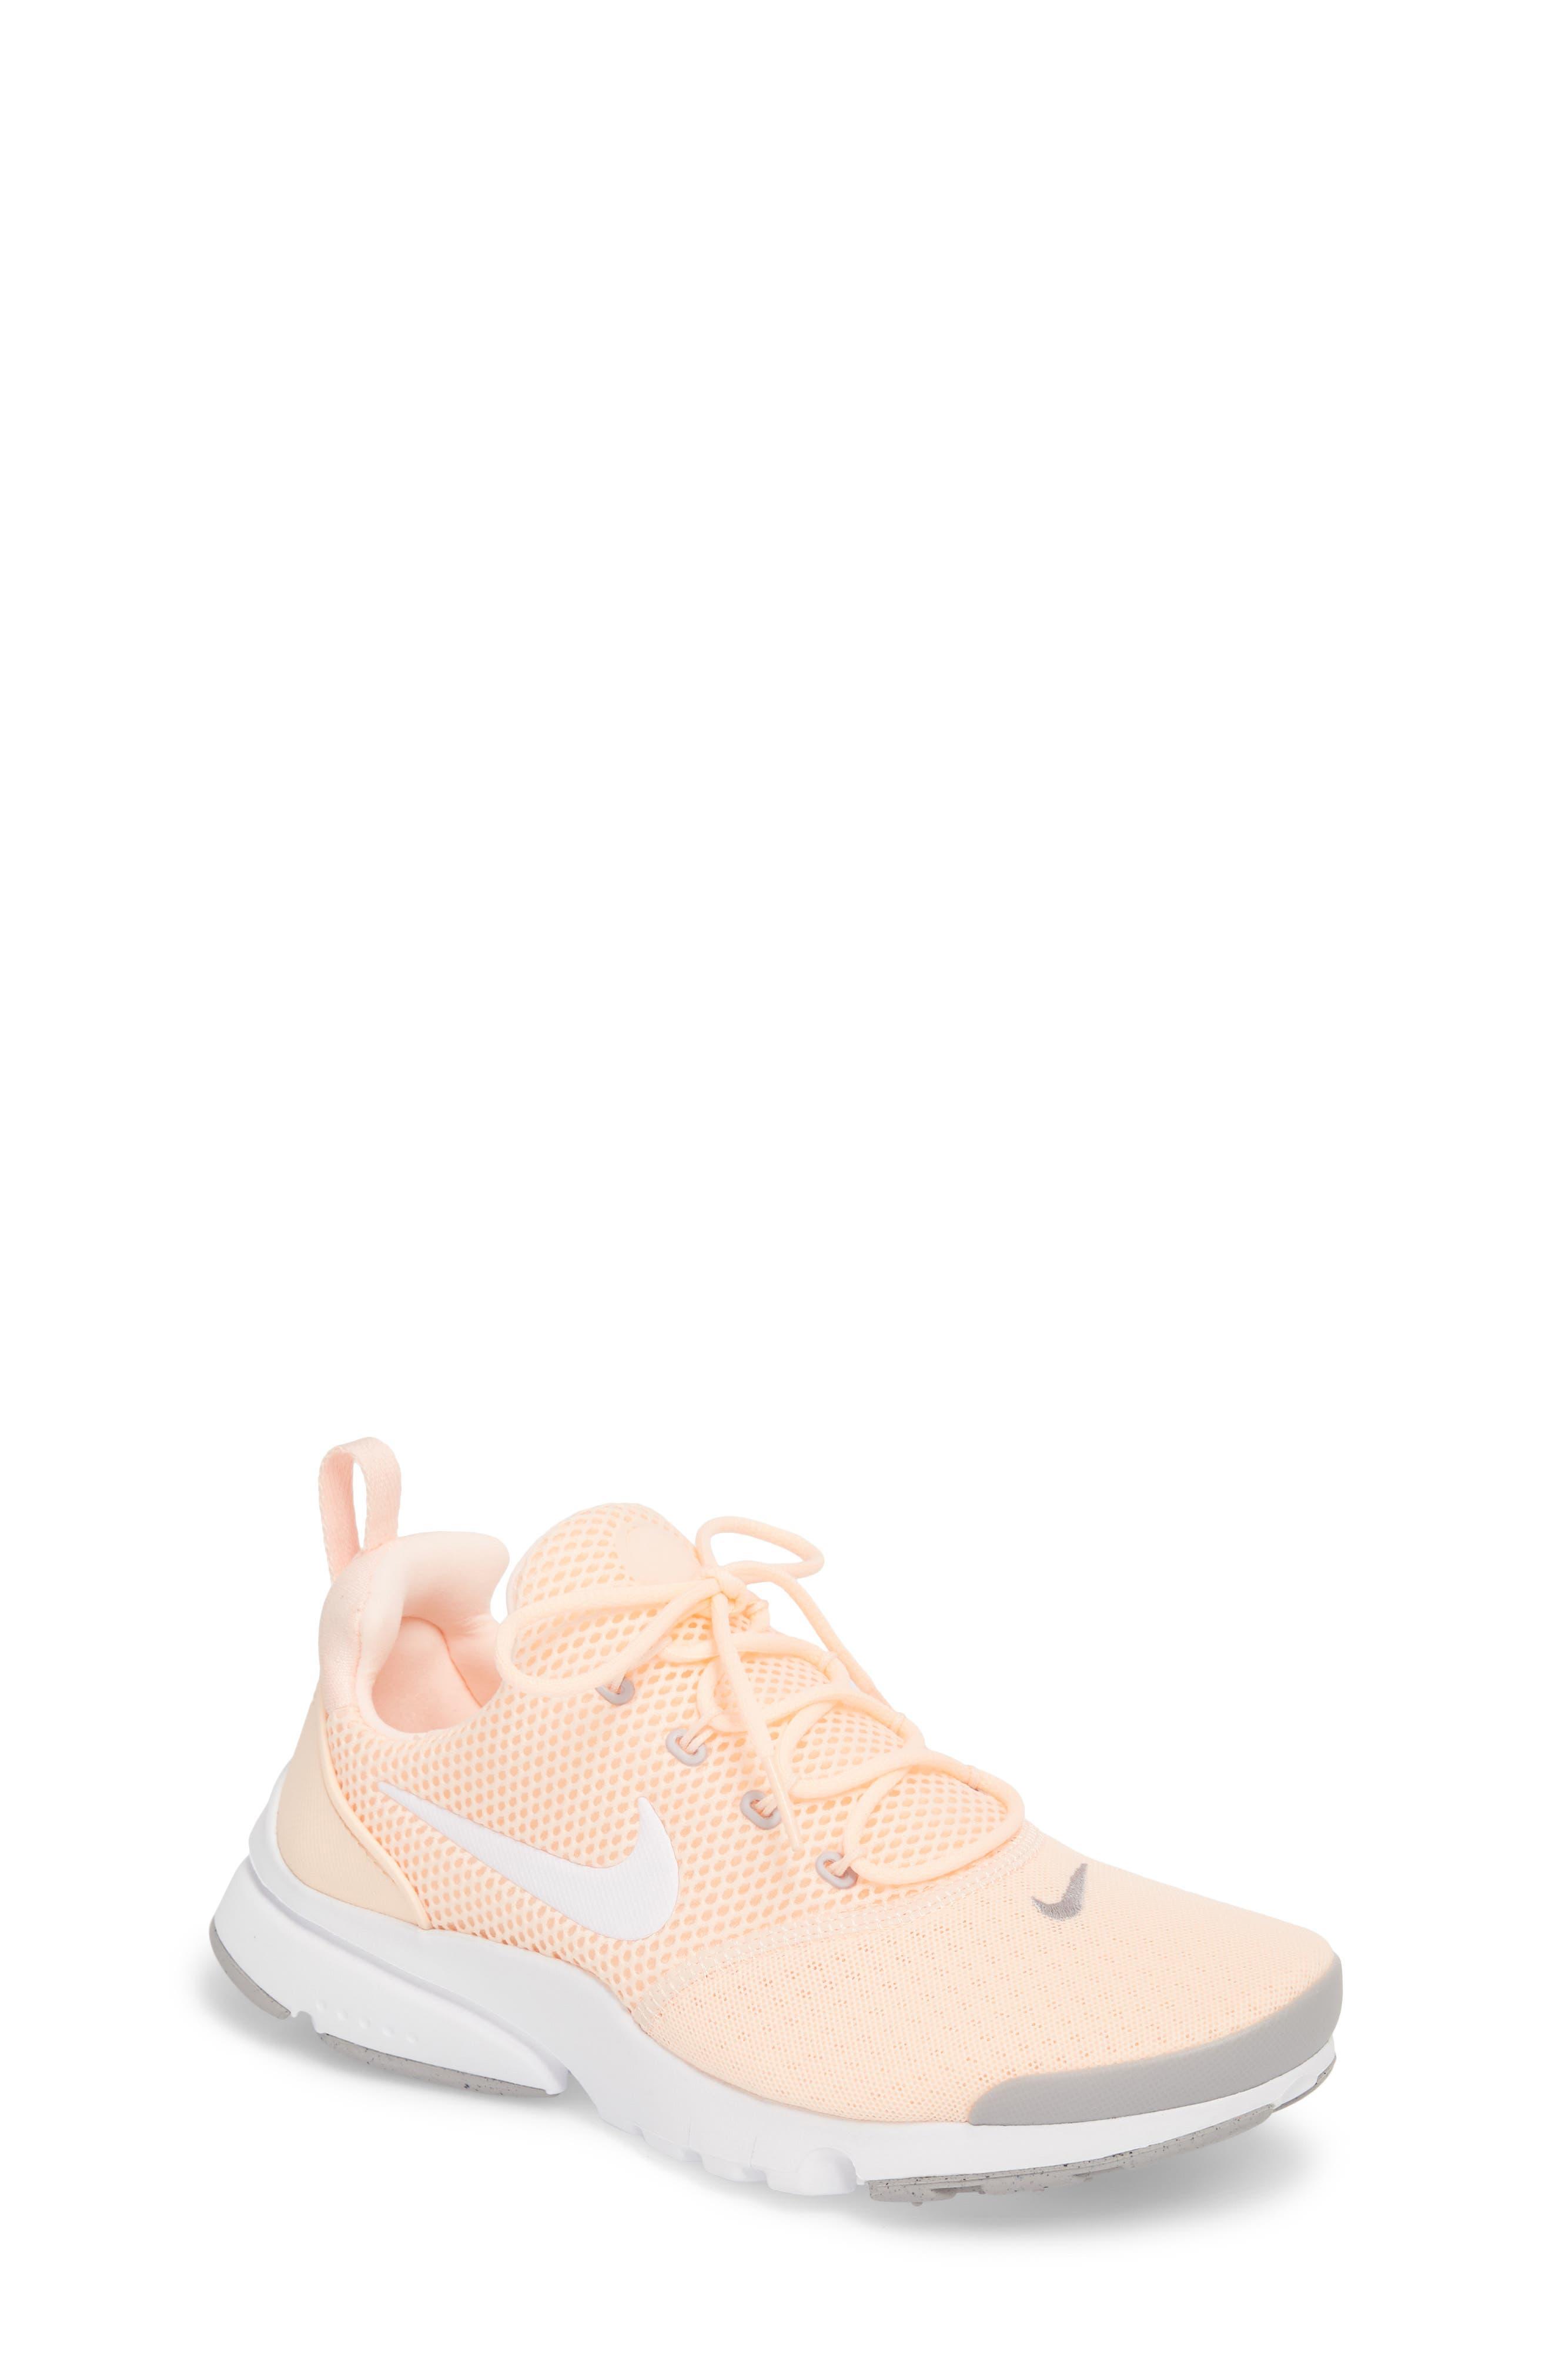 Presto Fly Sneaker,                         Main,                         color, Crimson Tint/ White/ Grey